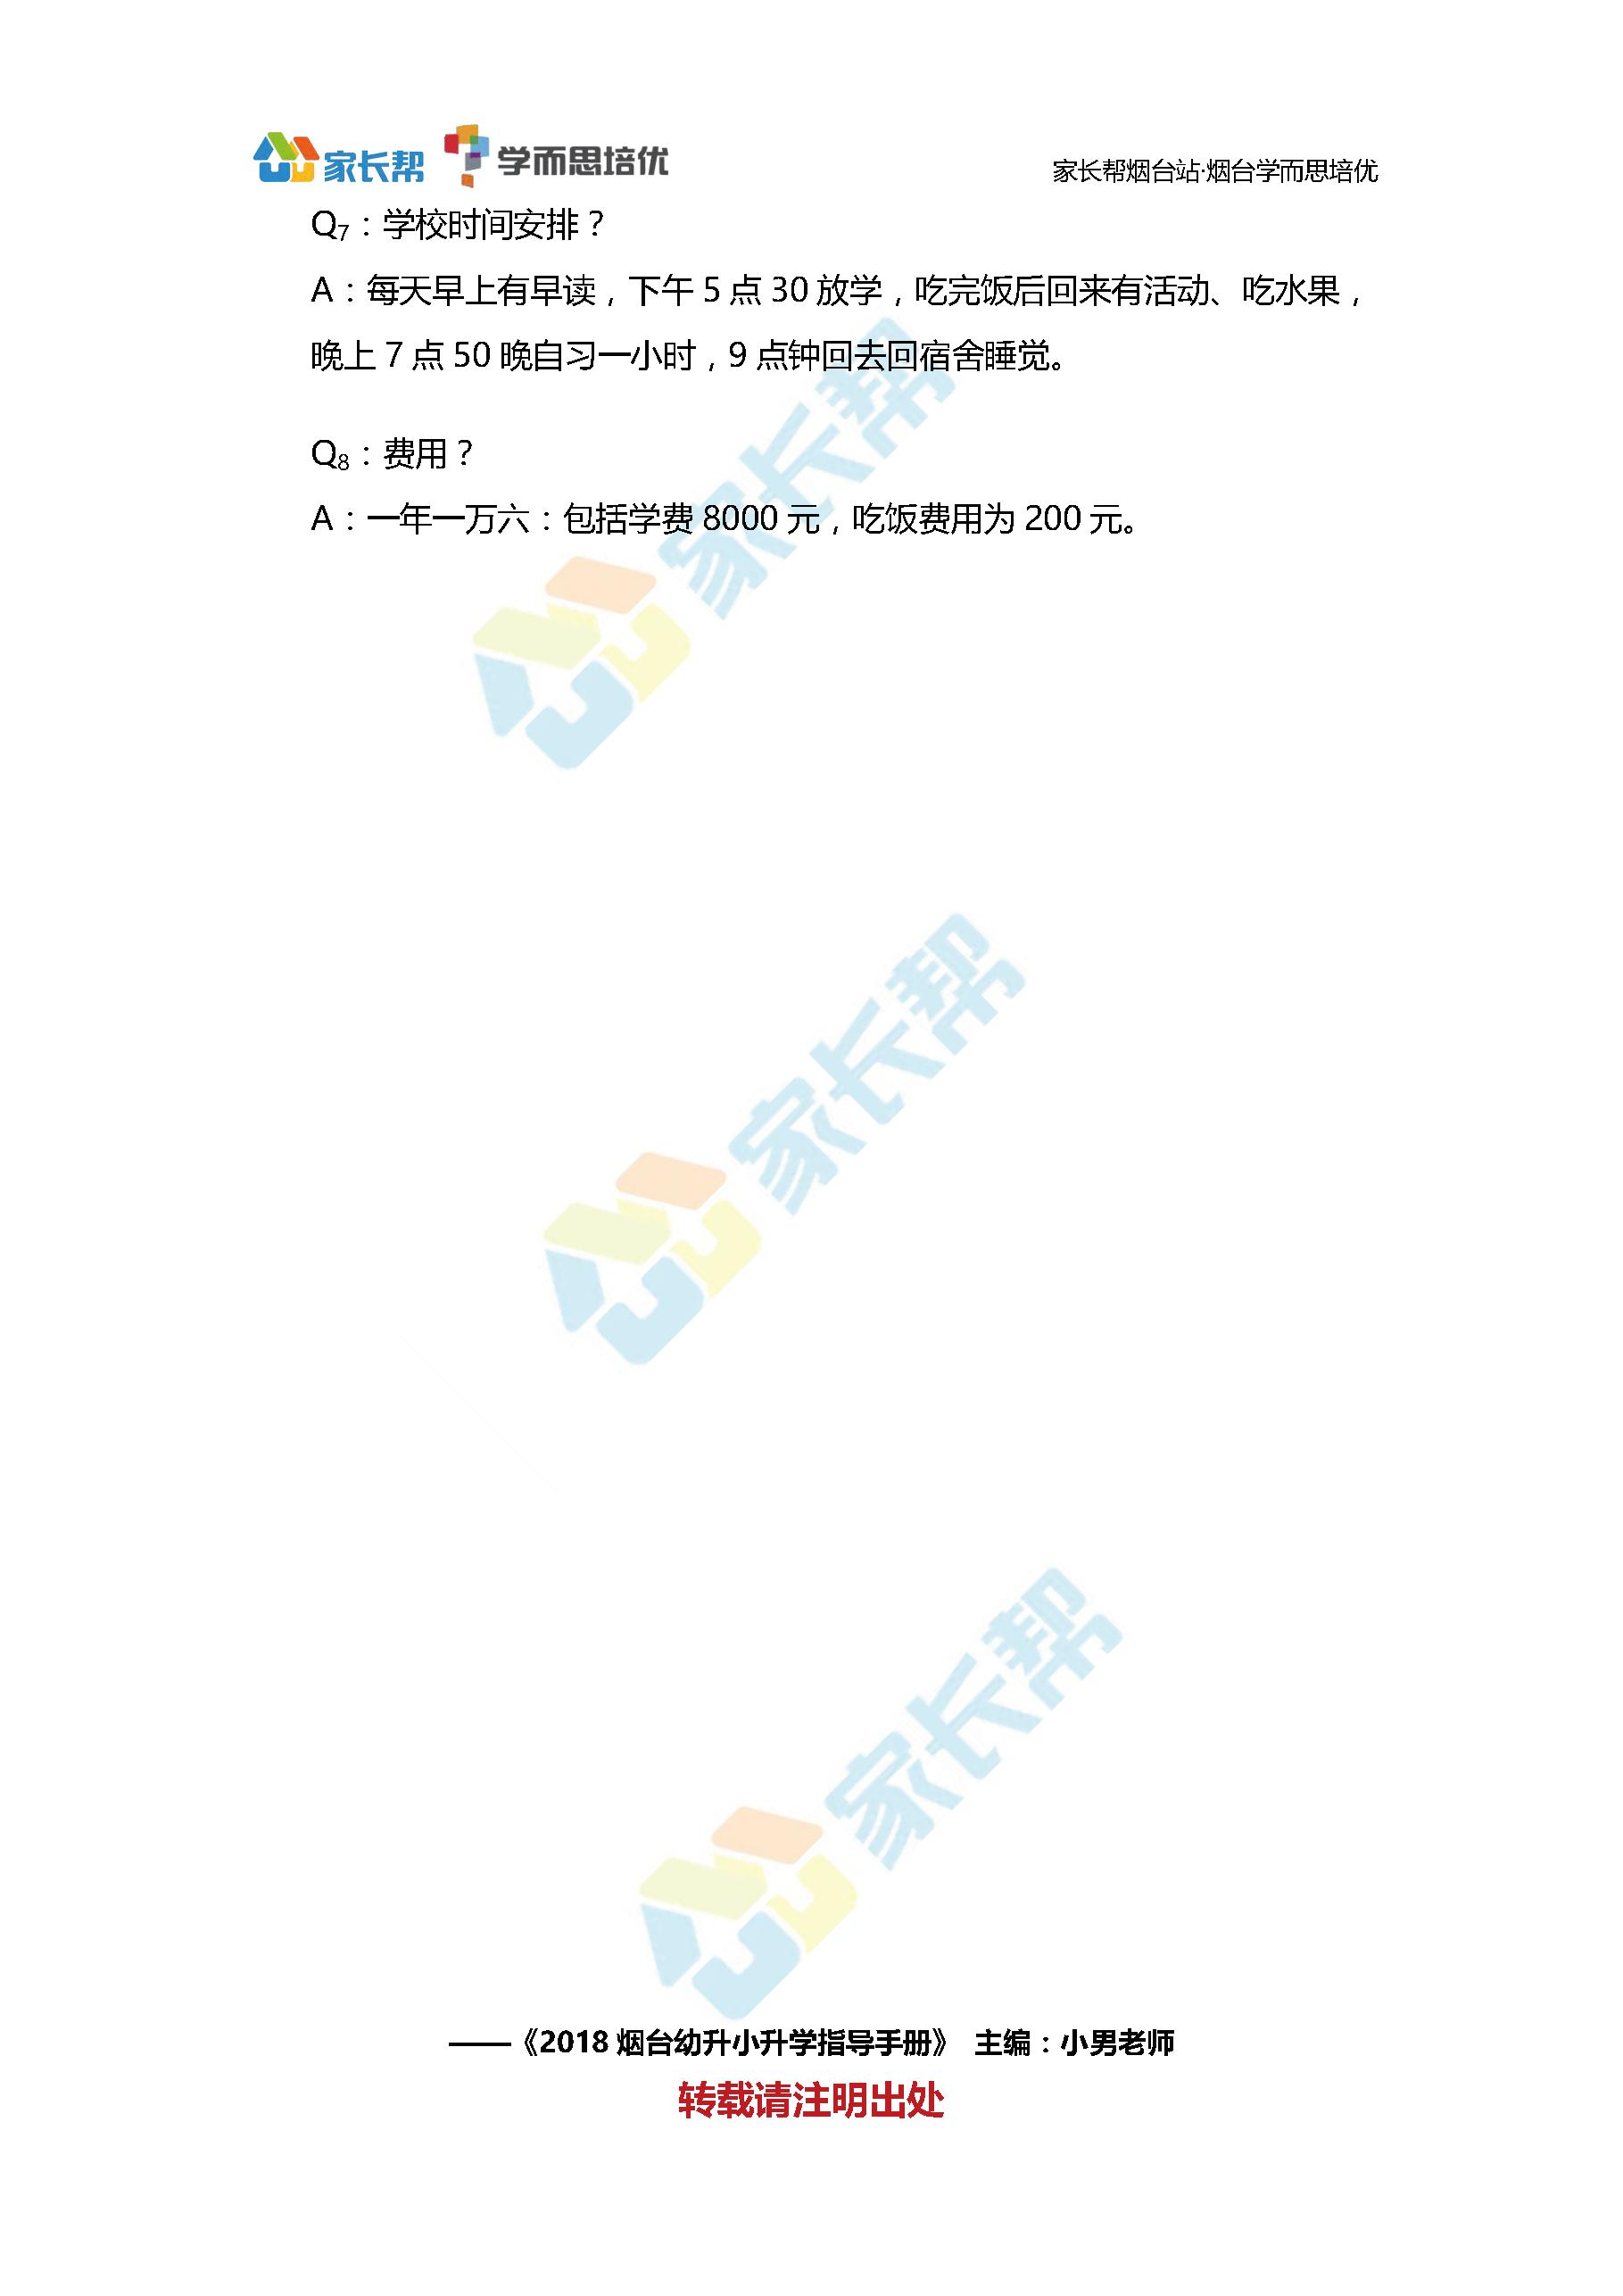 文档1_页面_4.png